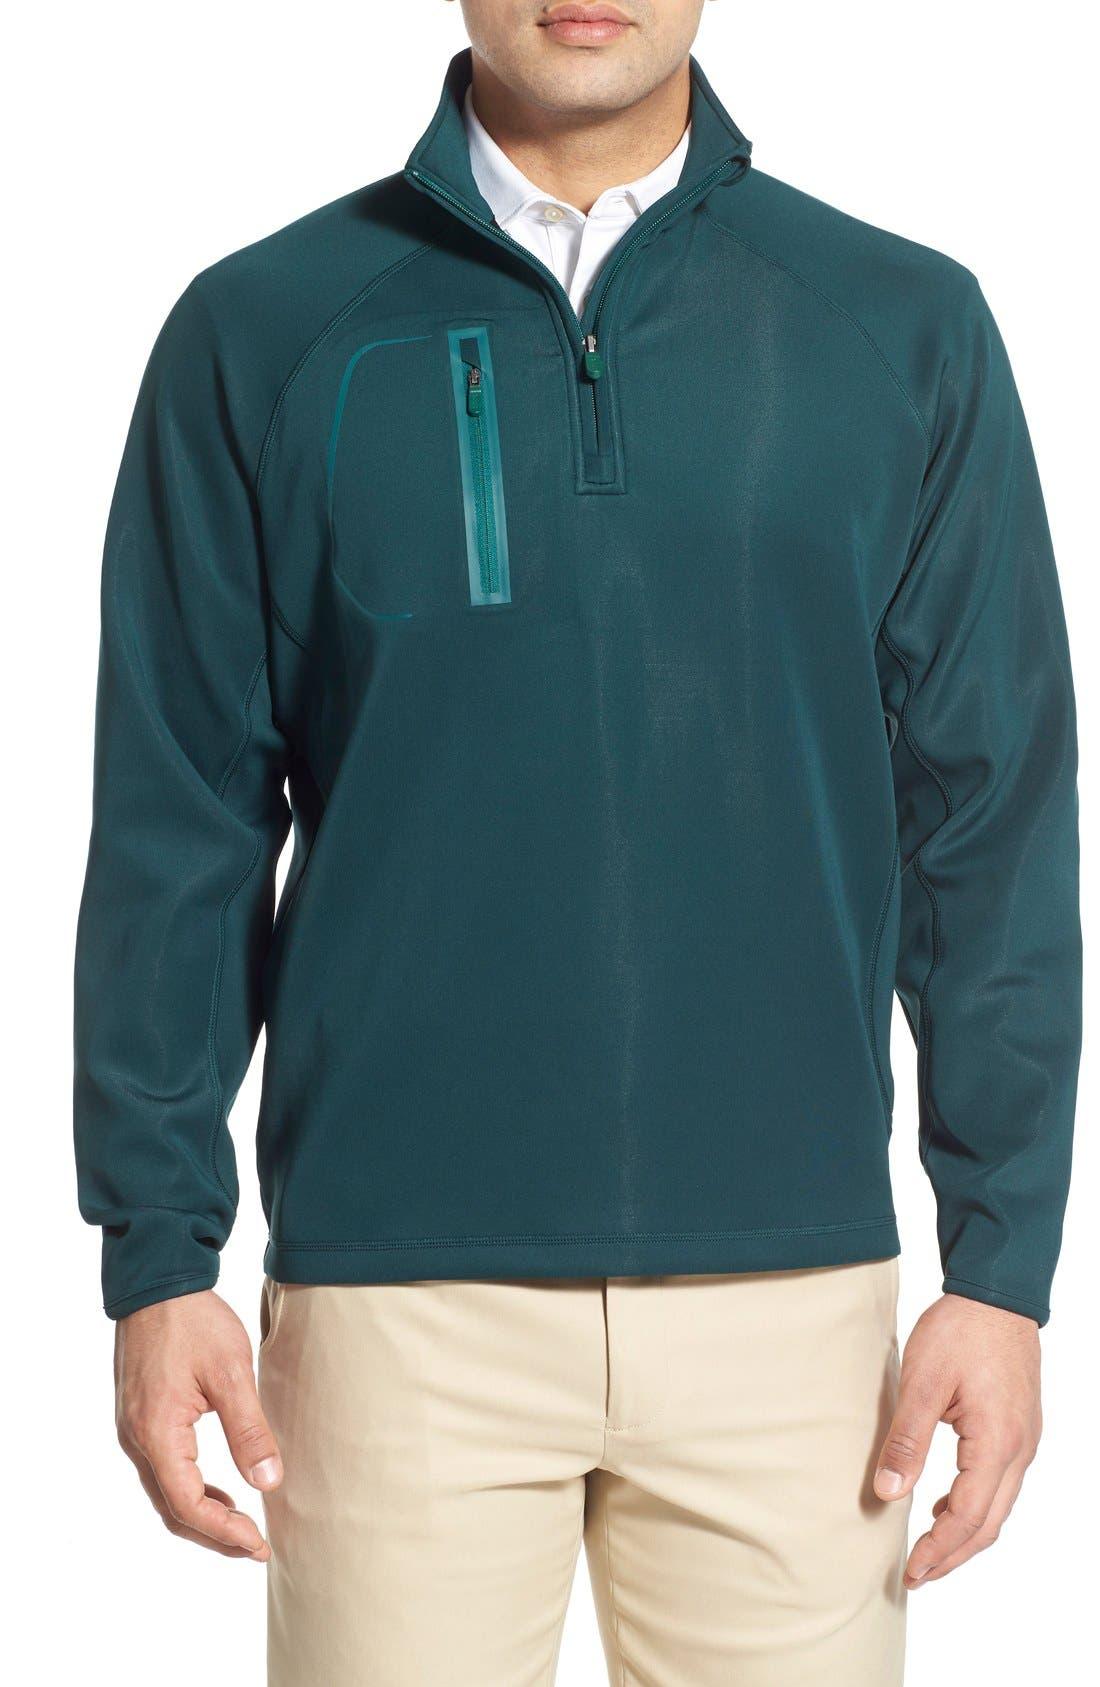 Alternate Image 1 Selected - Bobby Jones XH2O Crawford Stretch Quarter Zip Golf Pullover